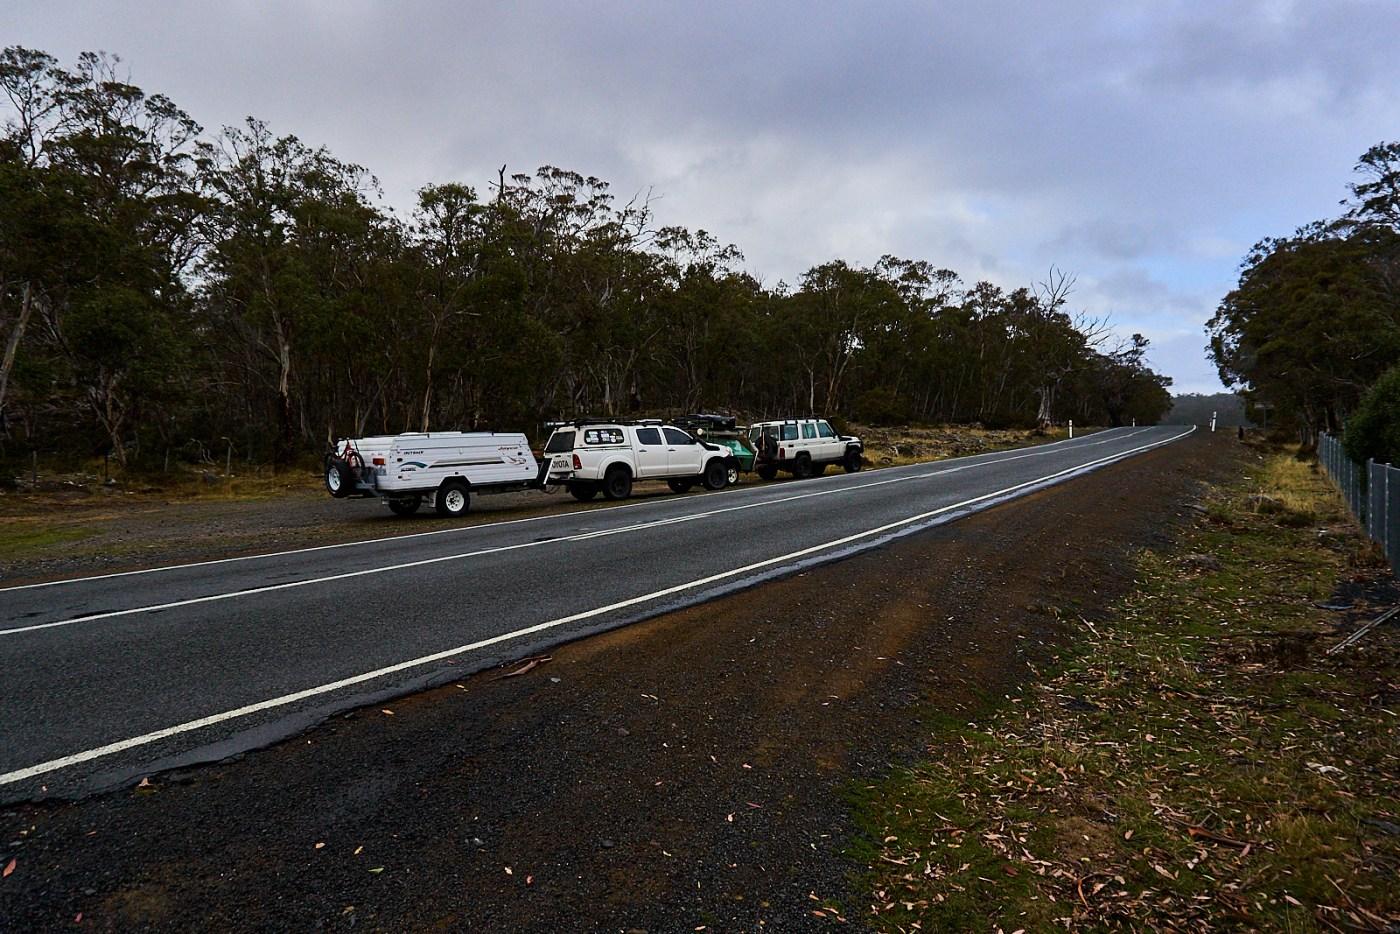 On the Road 1 - Adamsfield Camping Trip